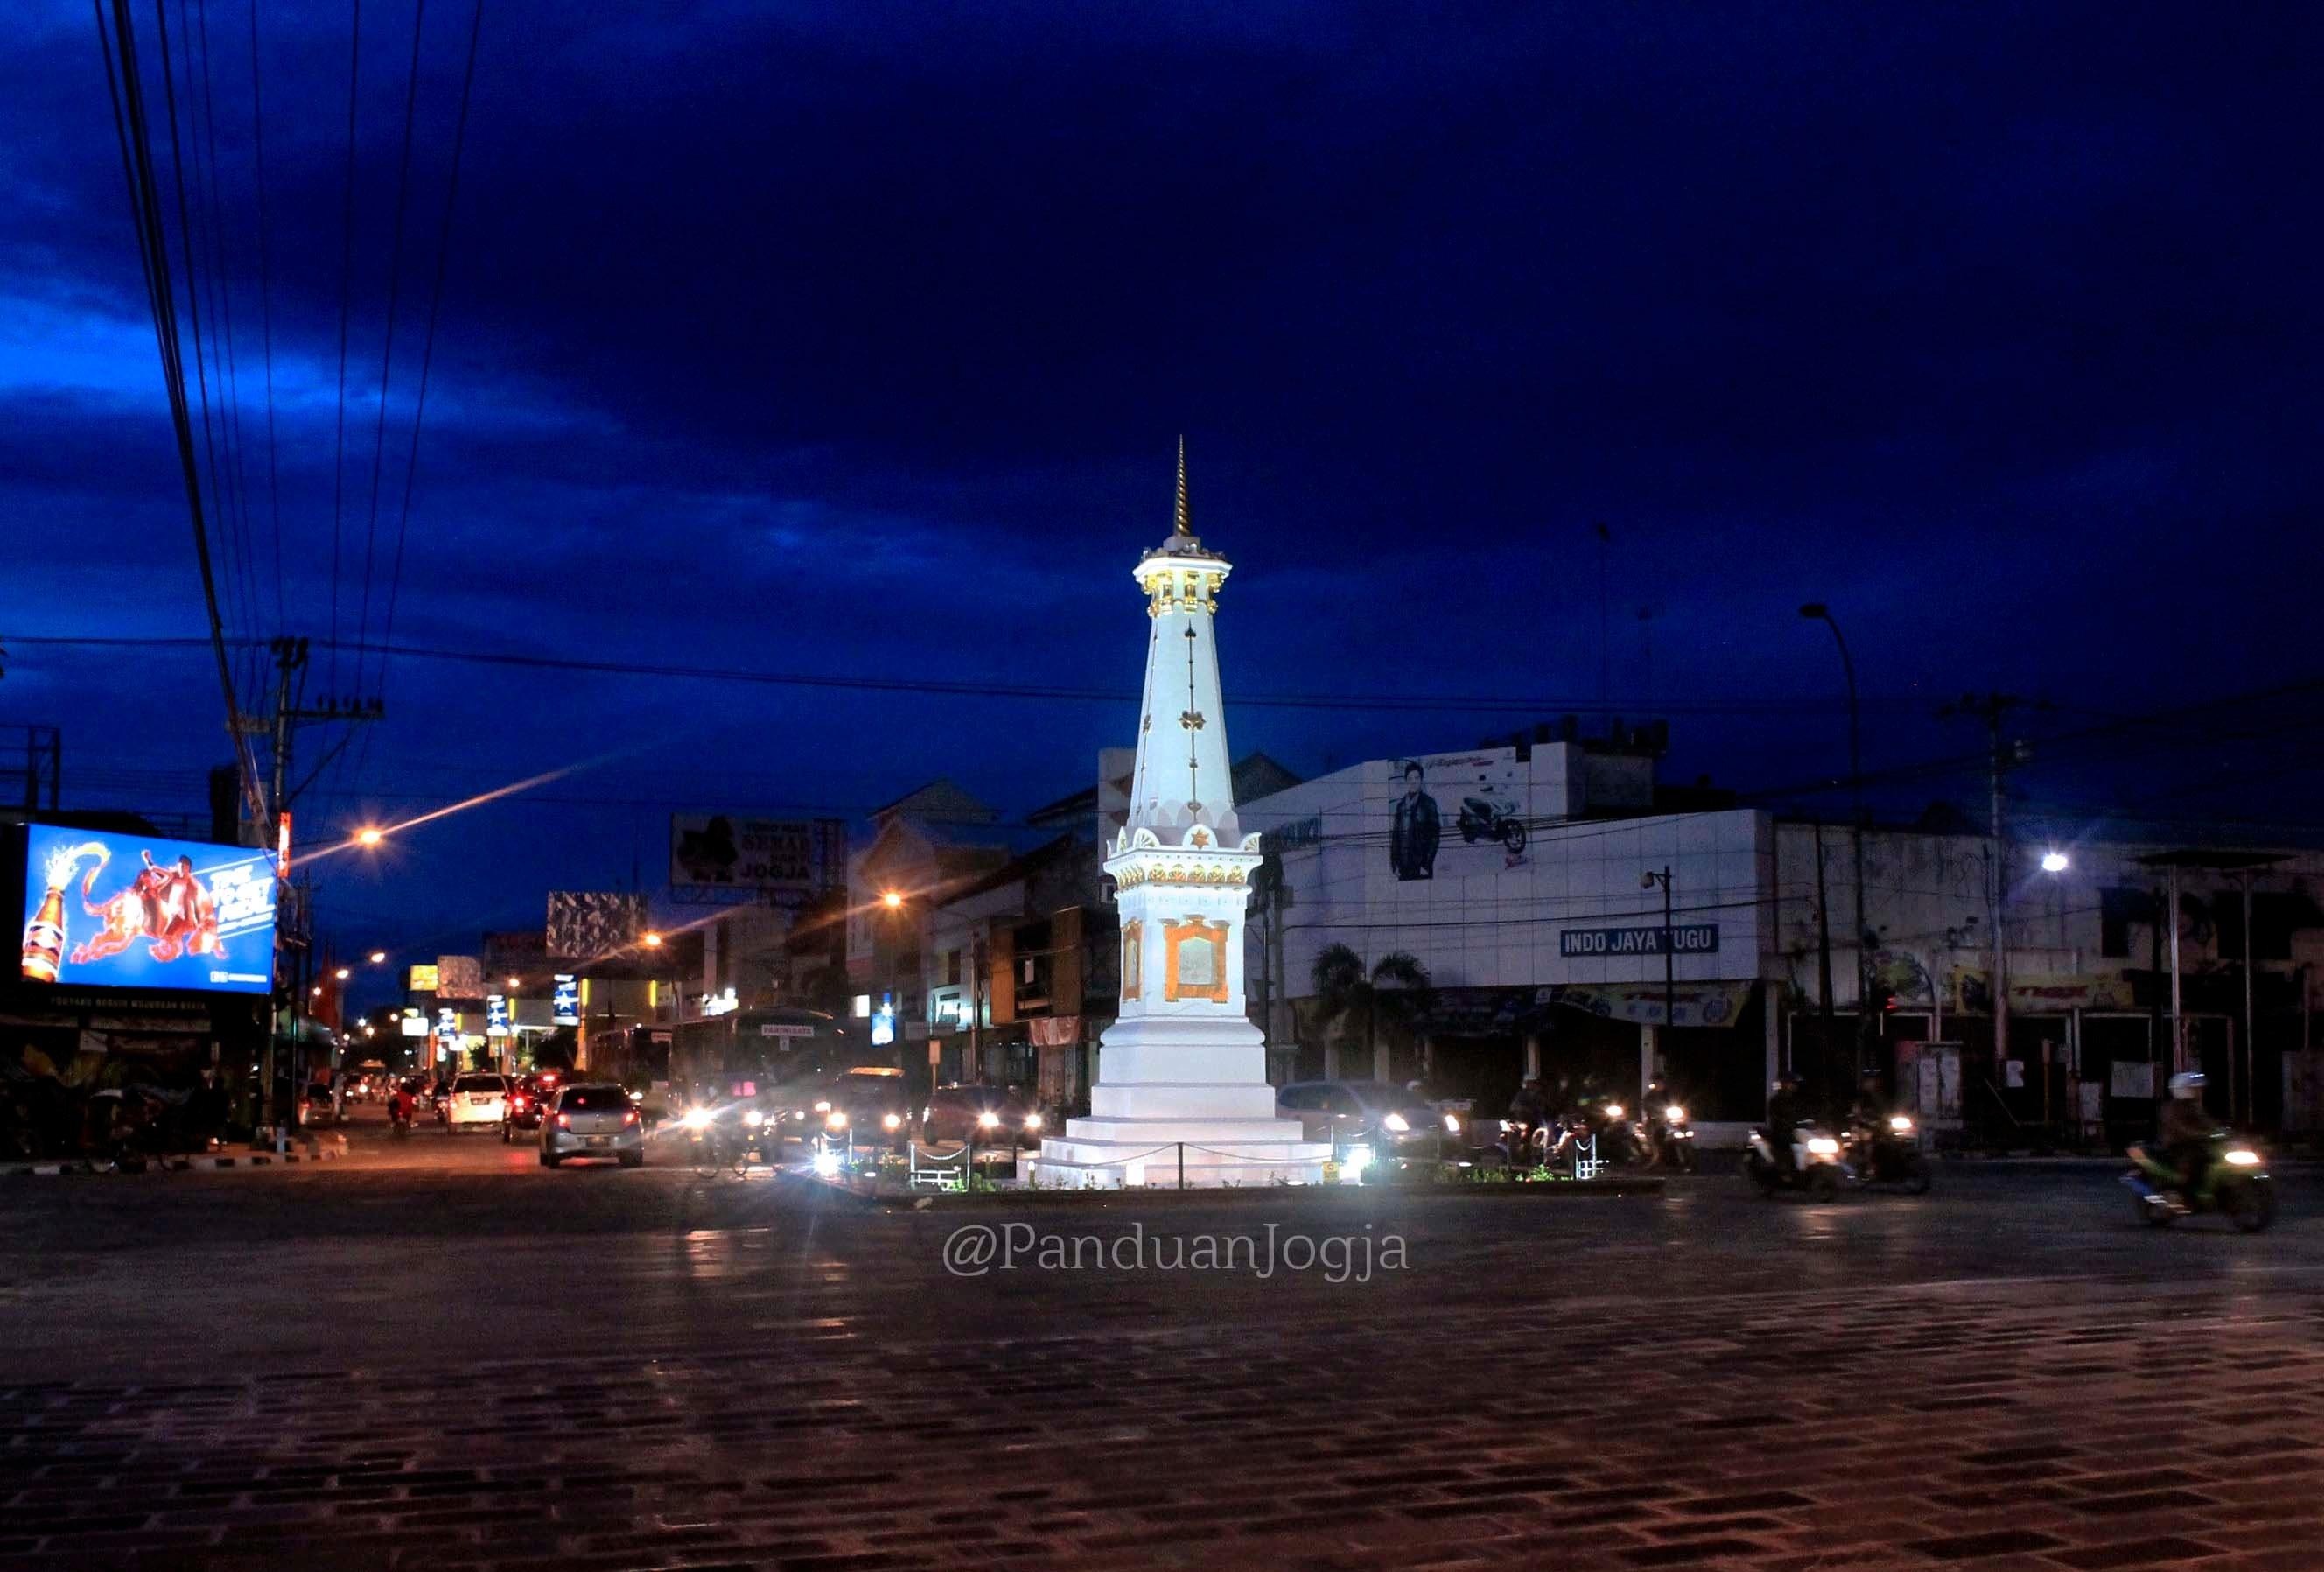 Tugu Monumen Yogyakarta Wisata Menjadi Symbol Pemersatu Rakyat Penguasa Kota